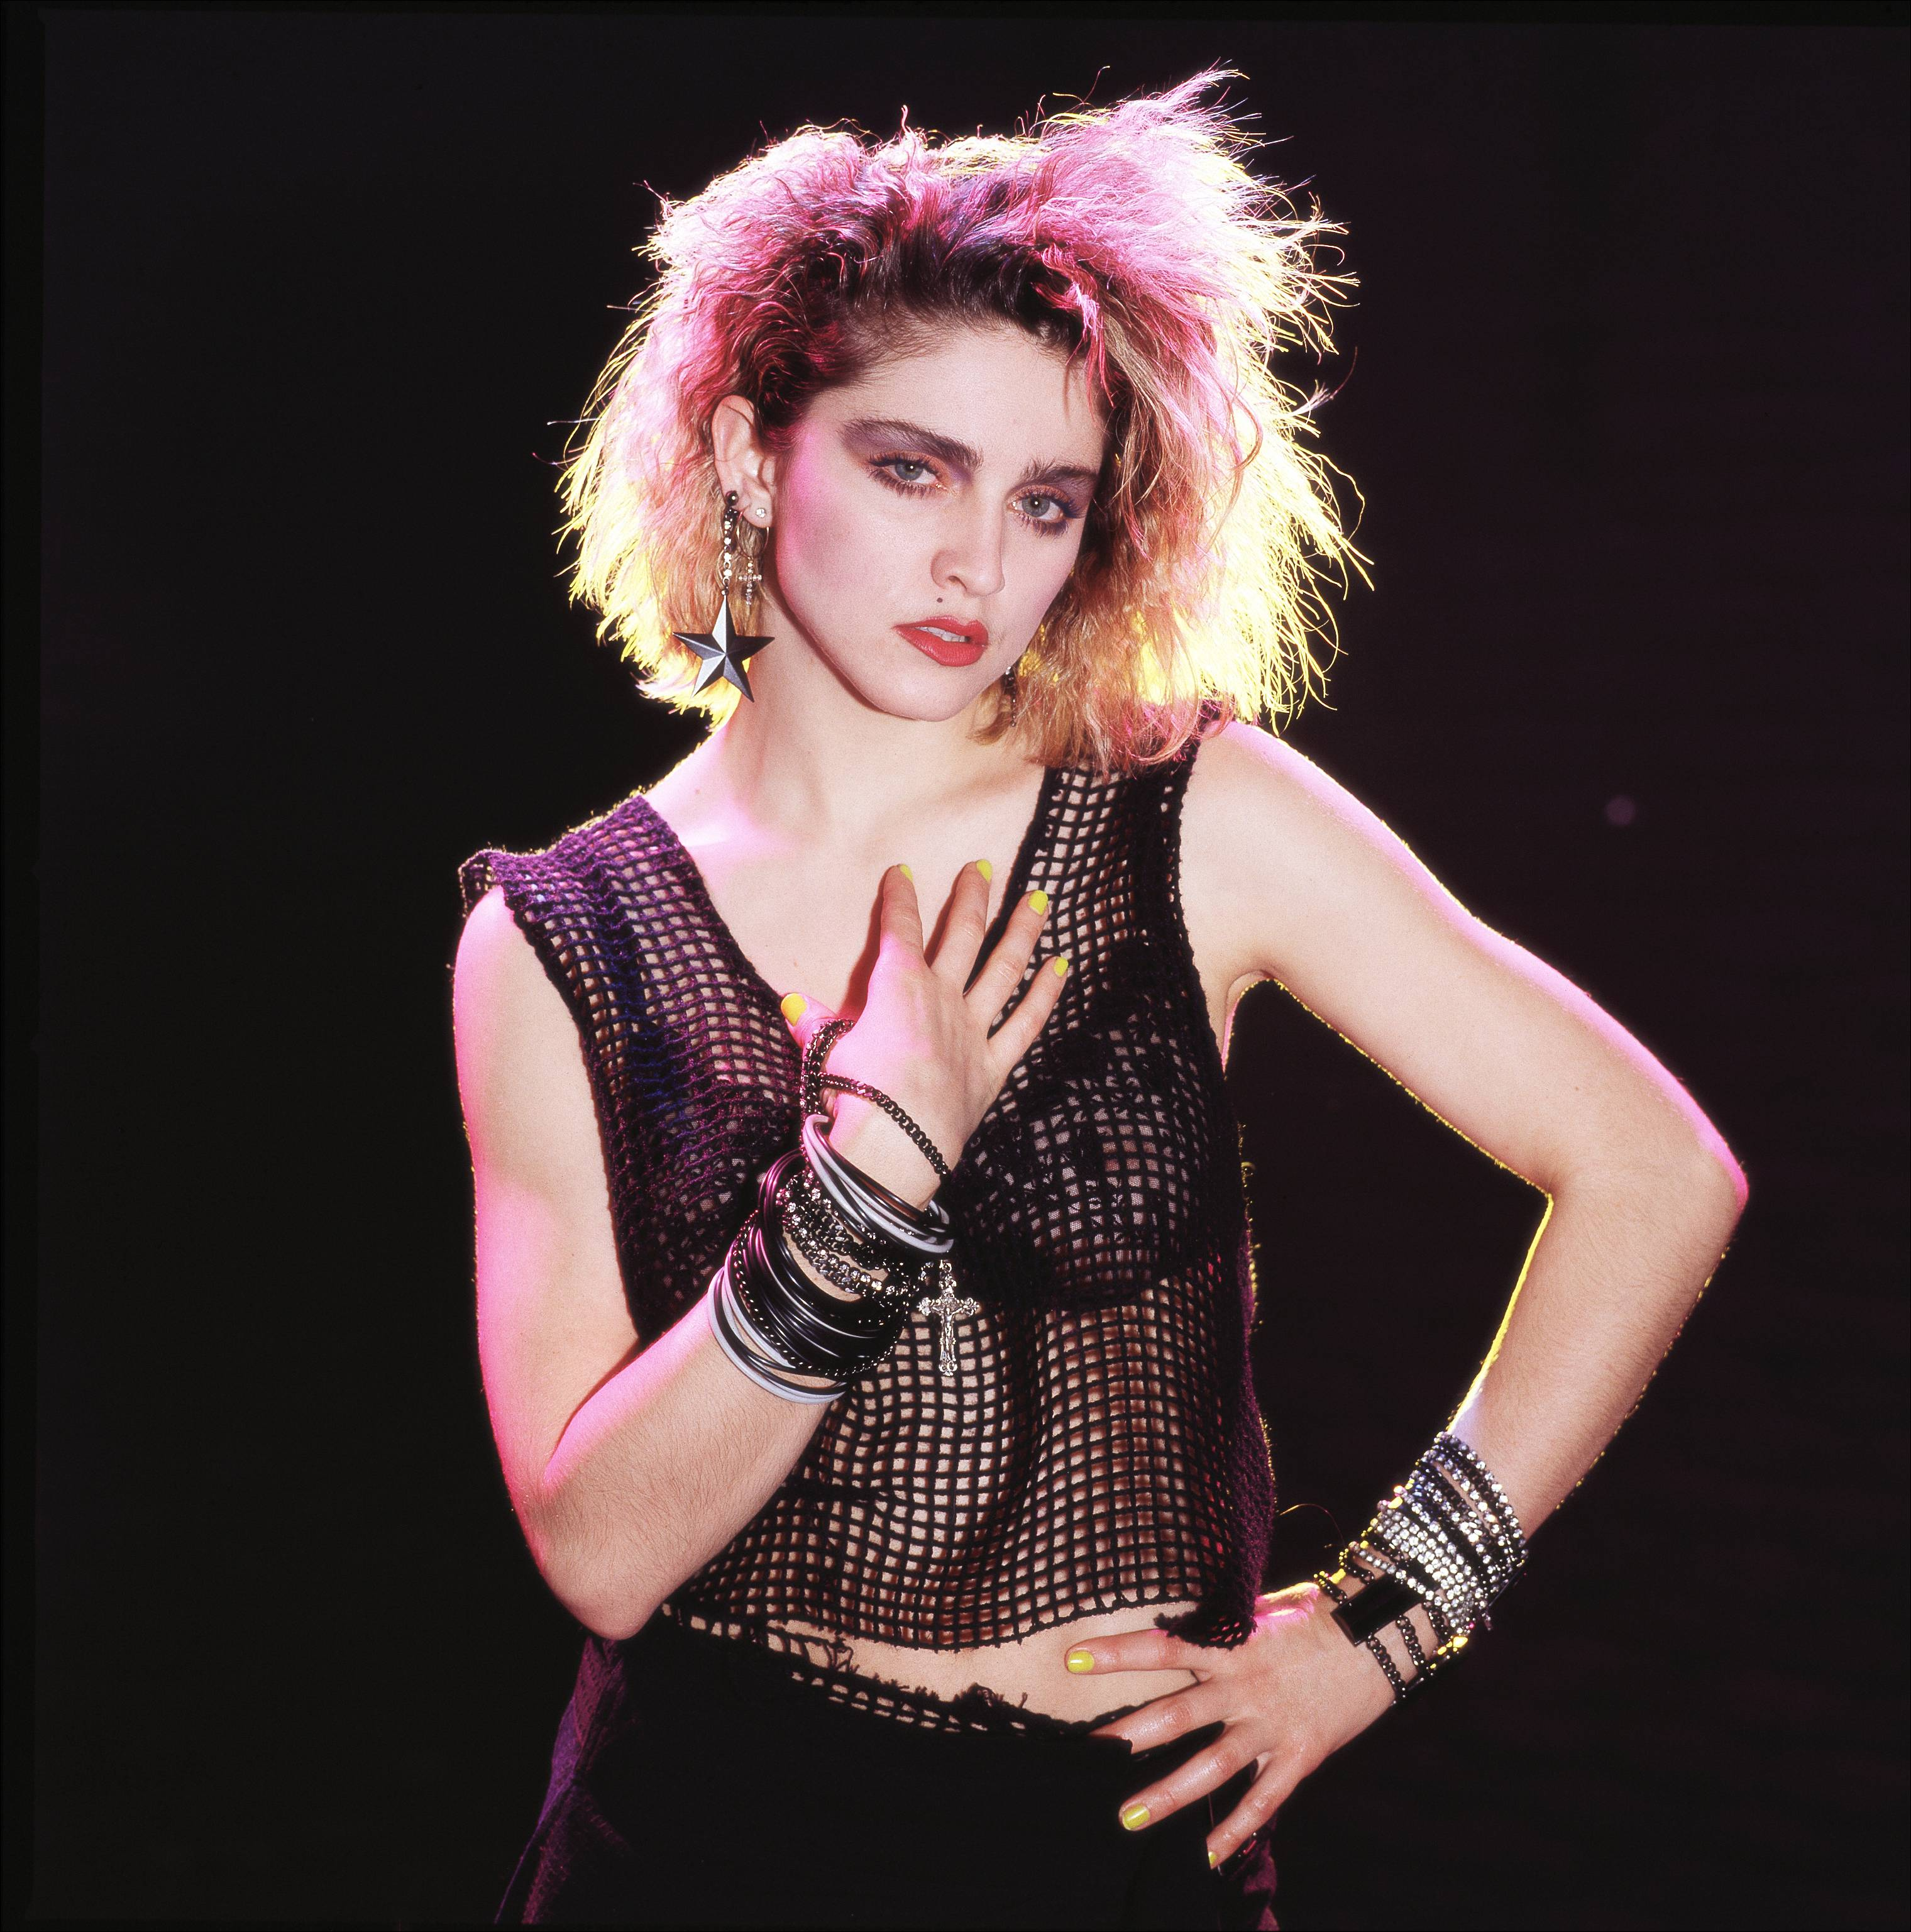 b560526b437 Lucky Star by Madonna | Song Lyrics, Album, Awards, History, Video ...